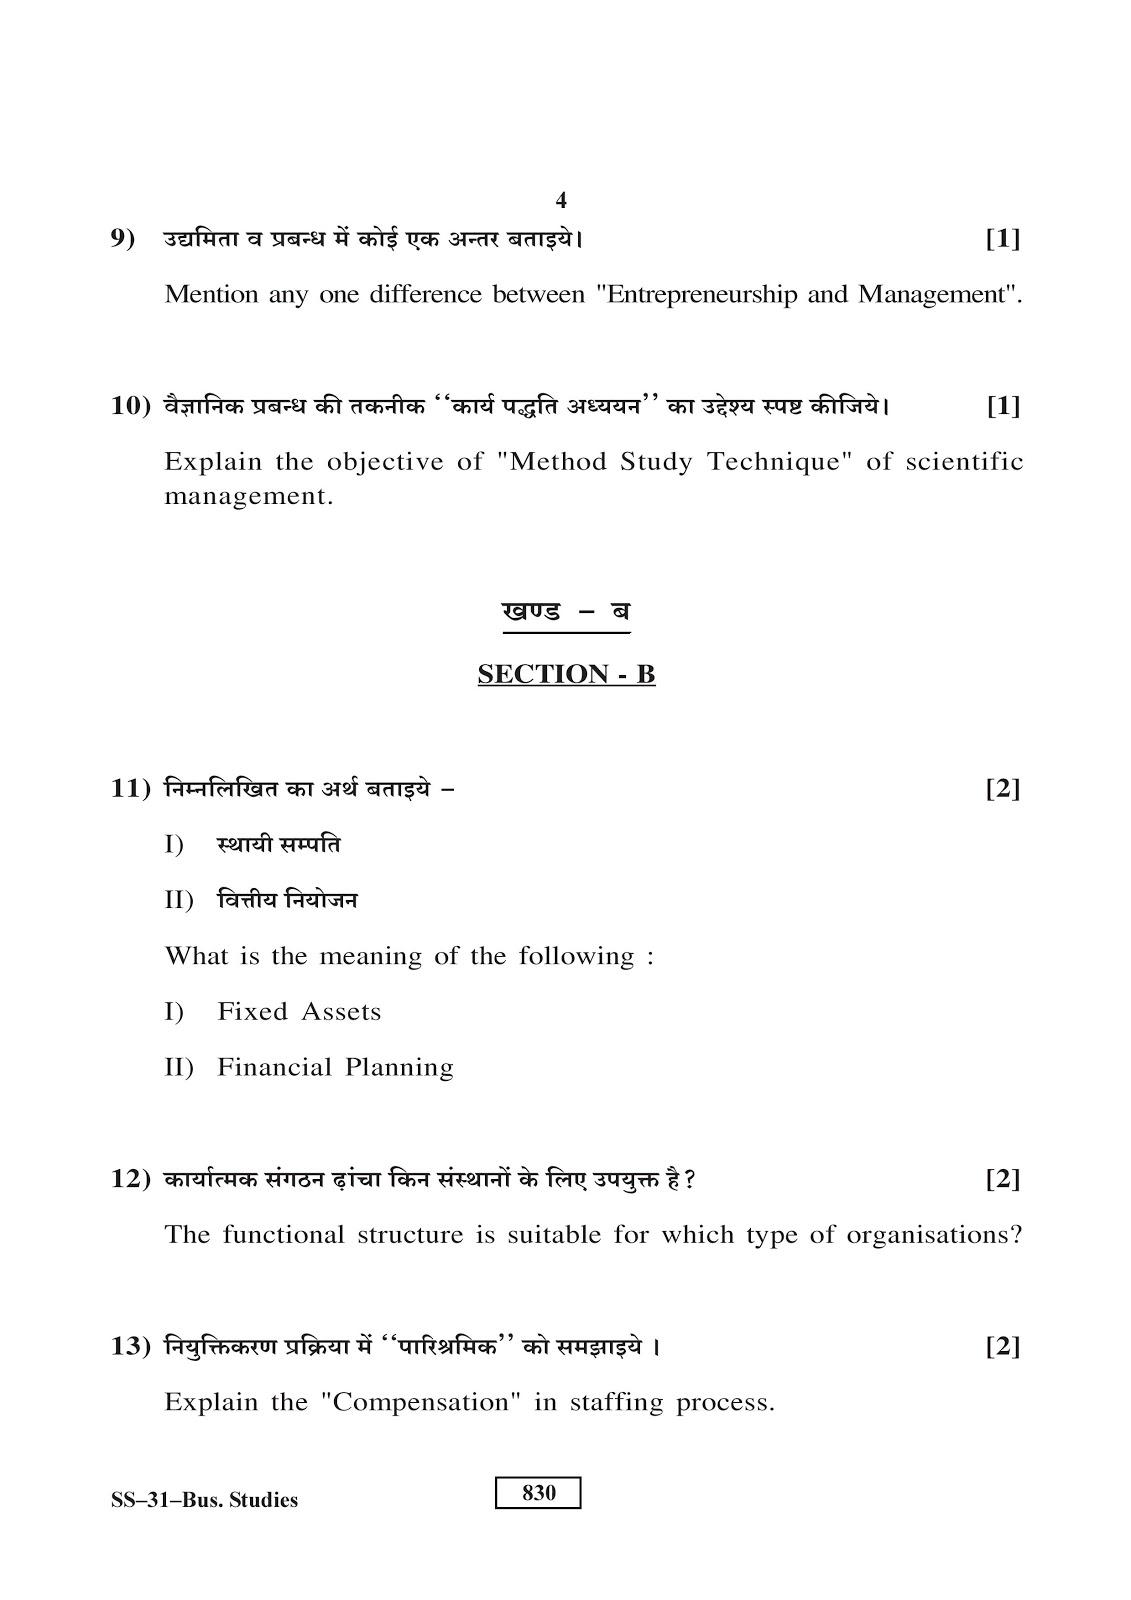 RBSE class 12th 2017 Business Studies question paper